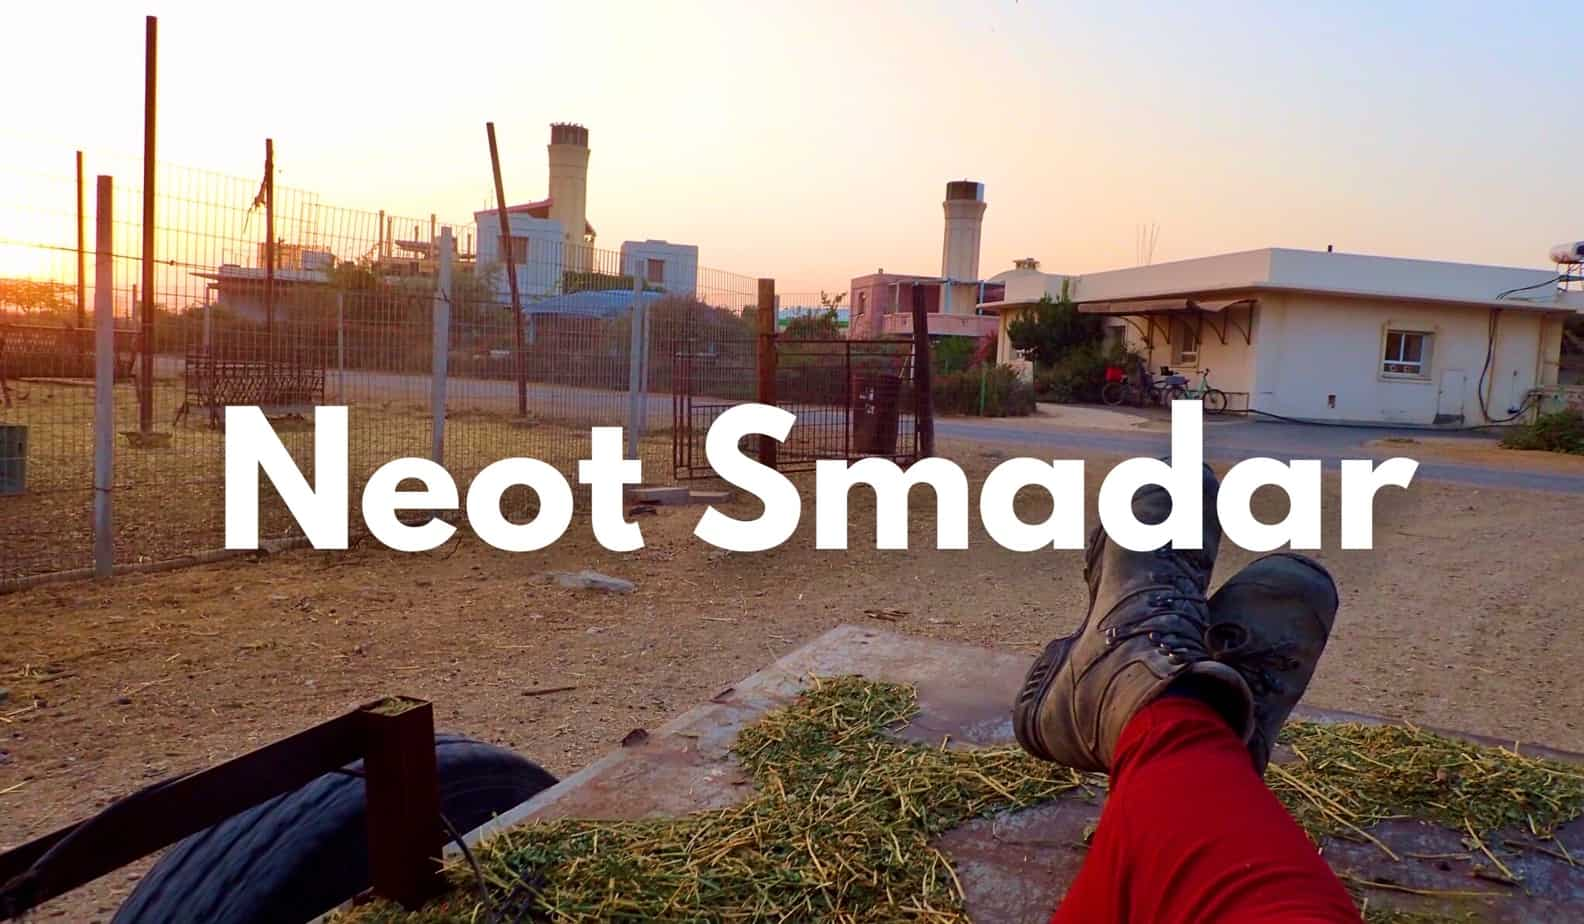 Neot Smadar